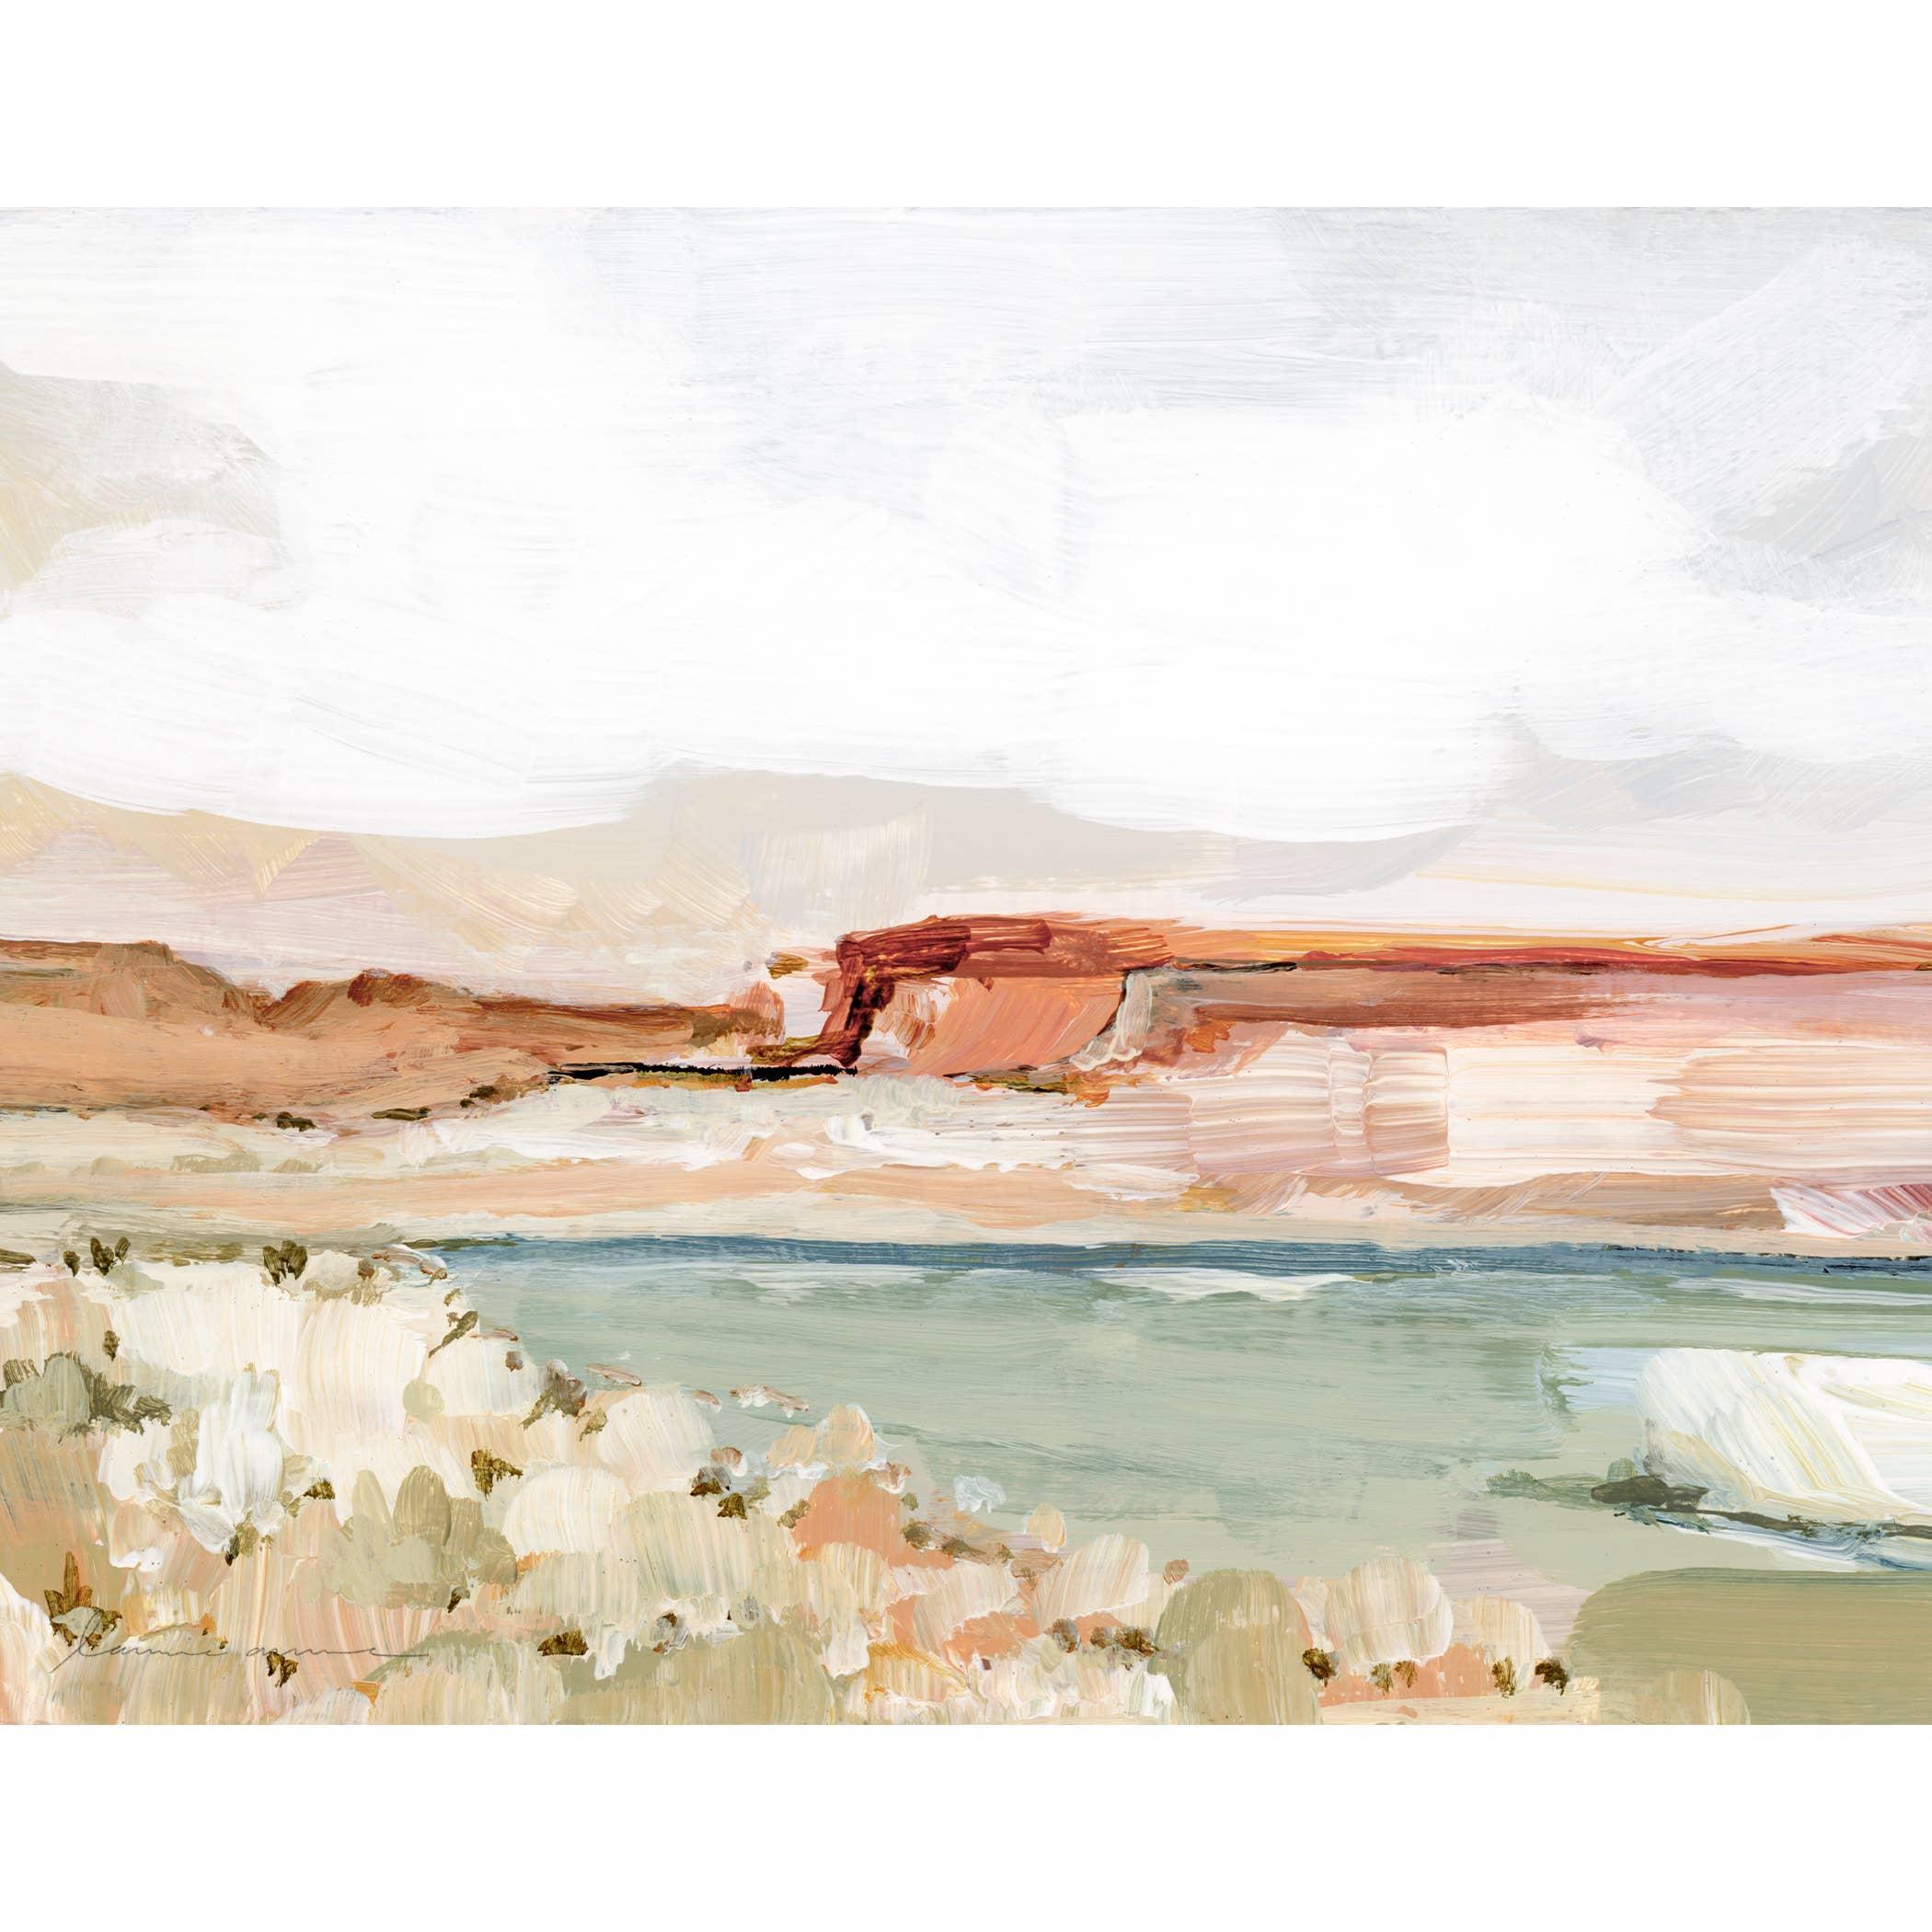 Vermillion Cliffs Horizontal Canvas Print   Trada Marketplace